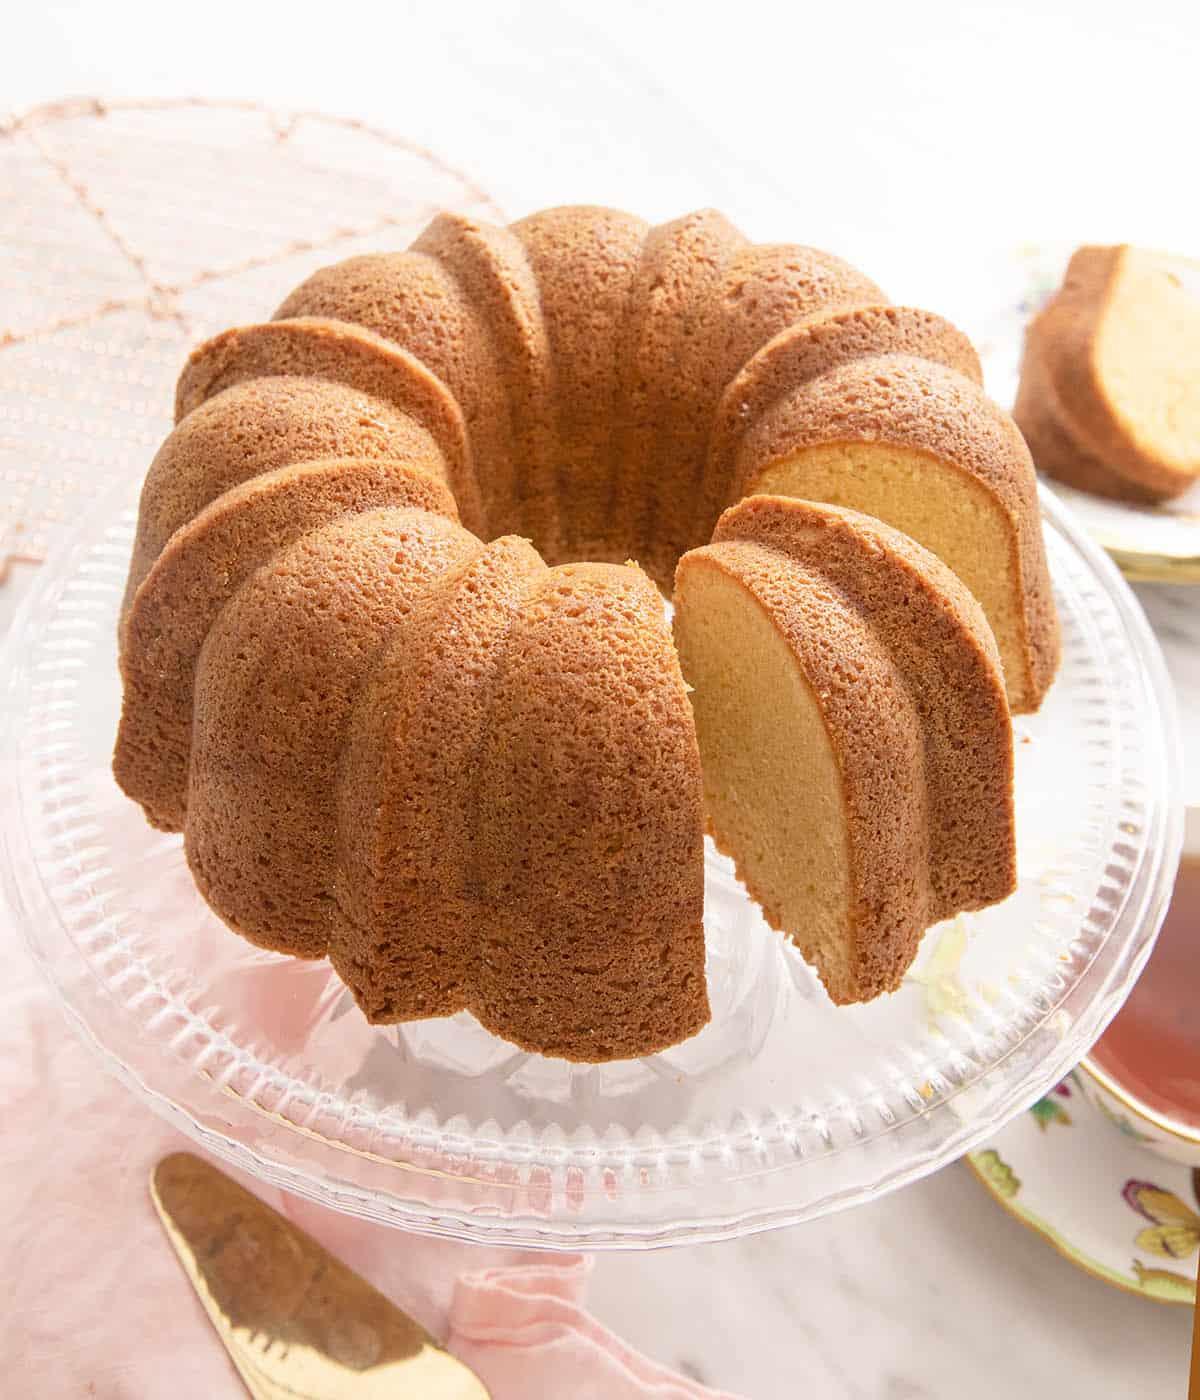 A sour cream pound cake on a cake stand